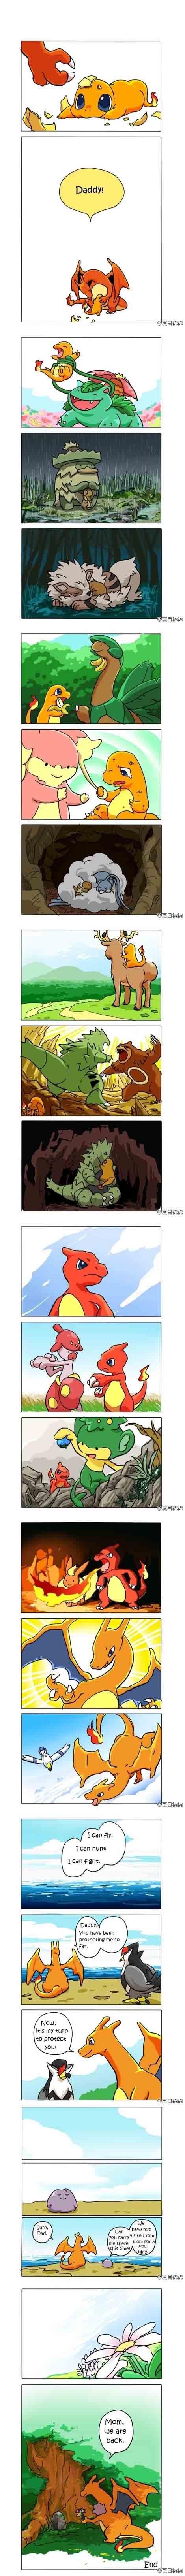 Pokemon Feels. Right in the freaking Feels. man hum. lean HEM. mam. Wu have been probating me so its my turn an menace tout feels Pokemon